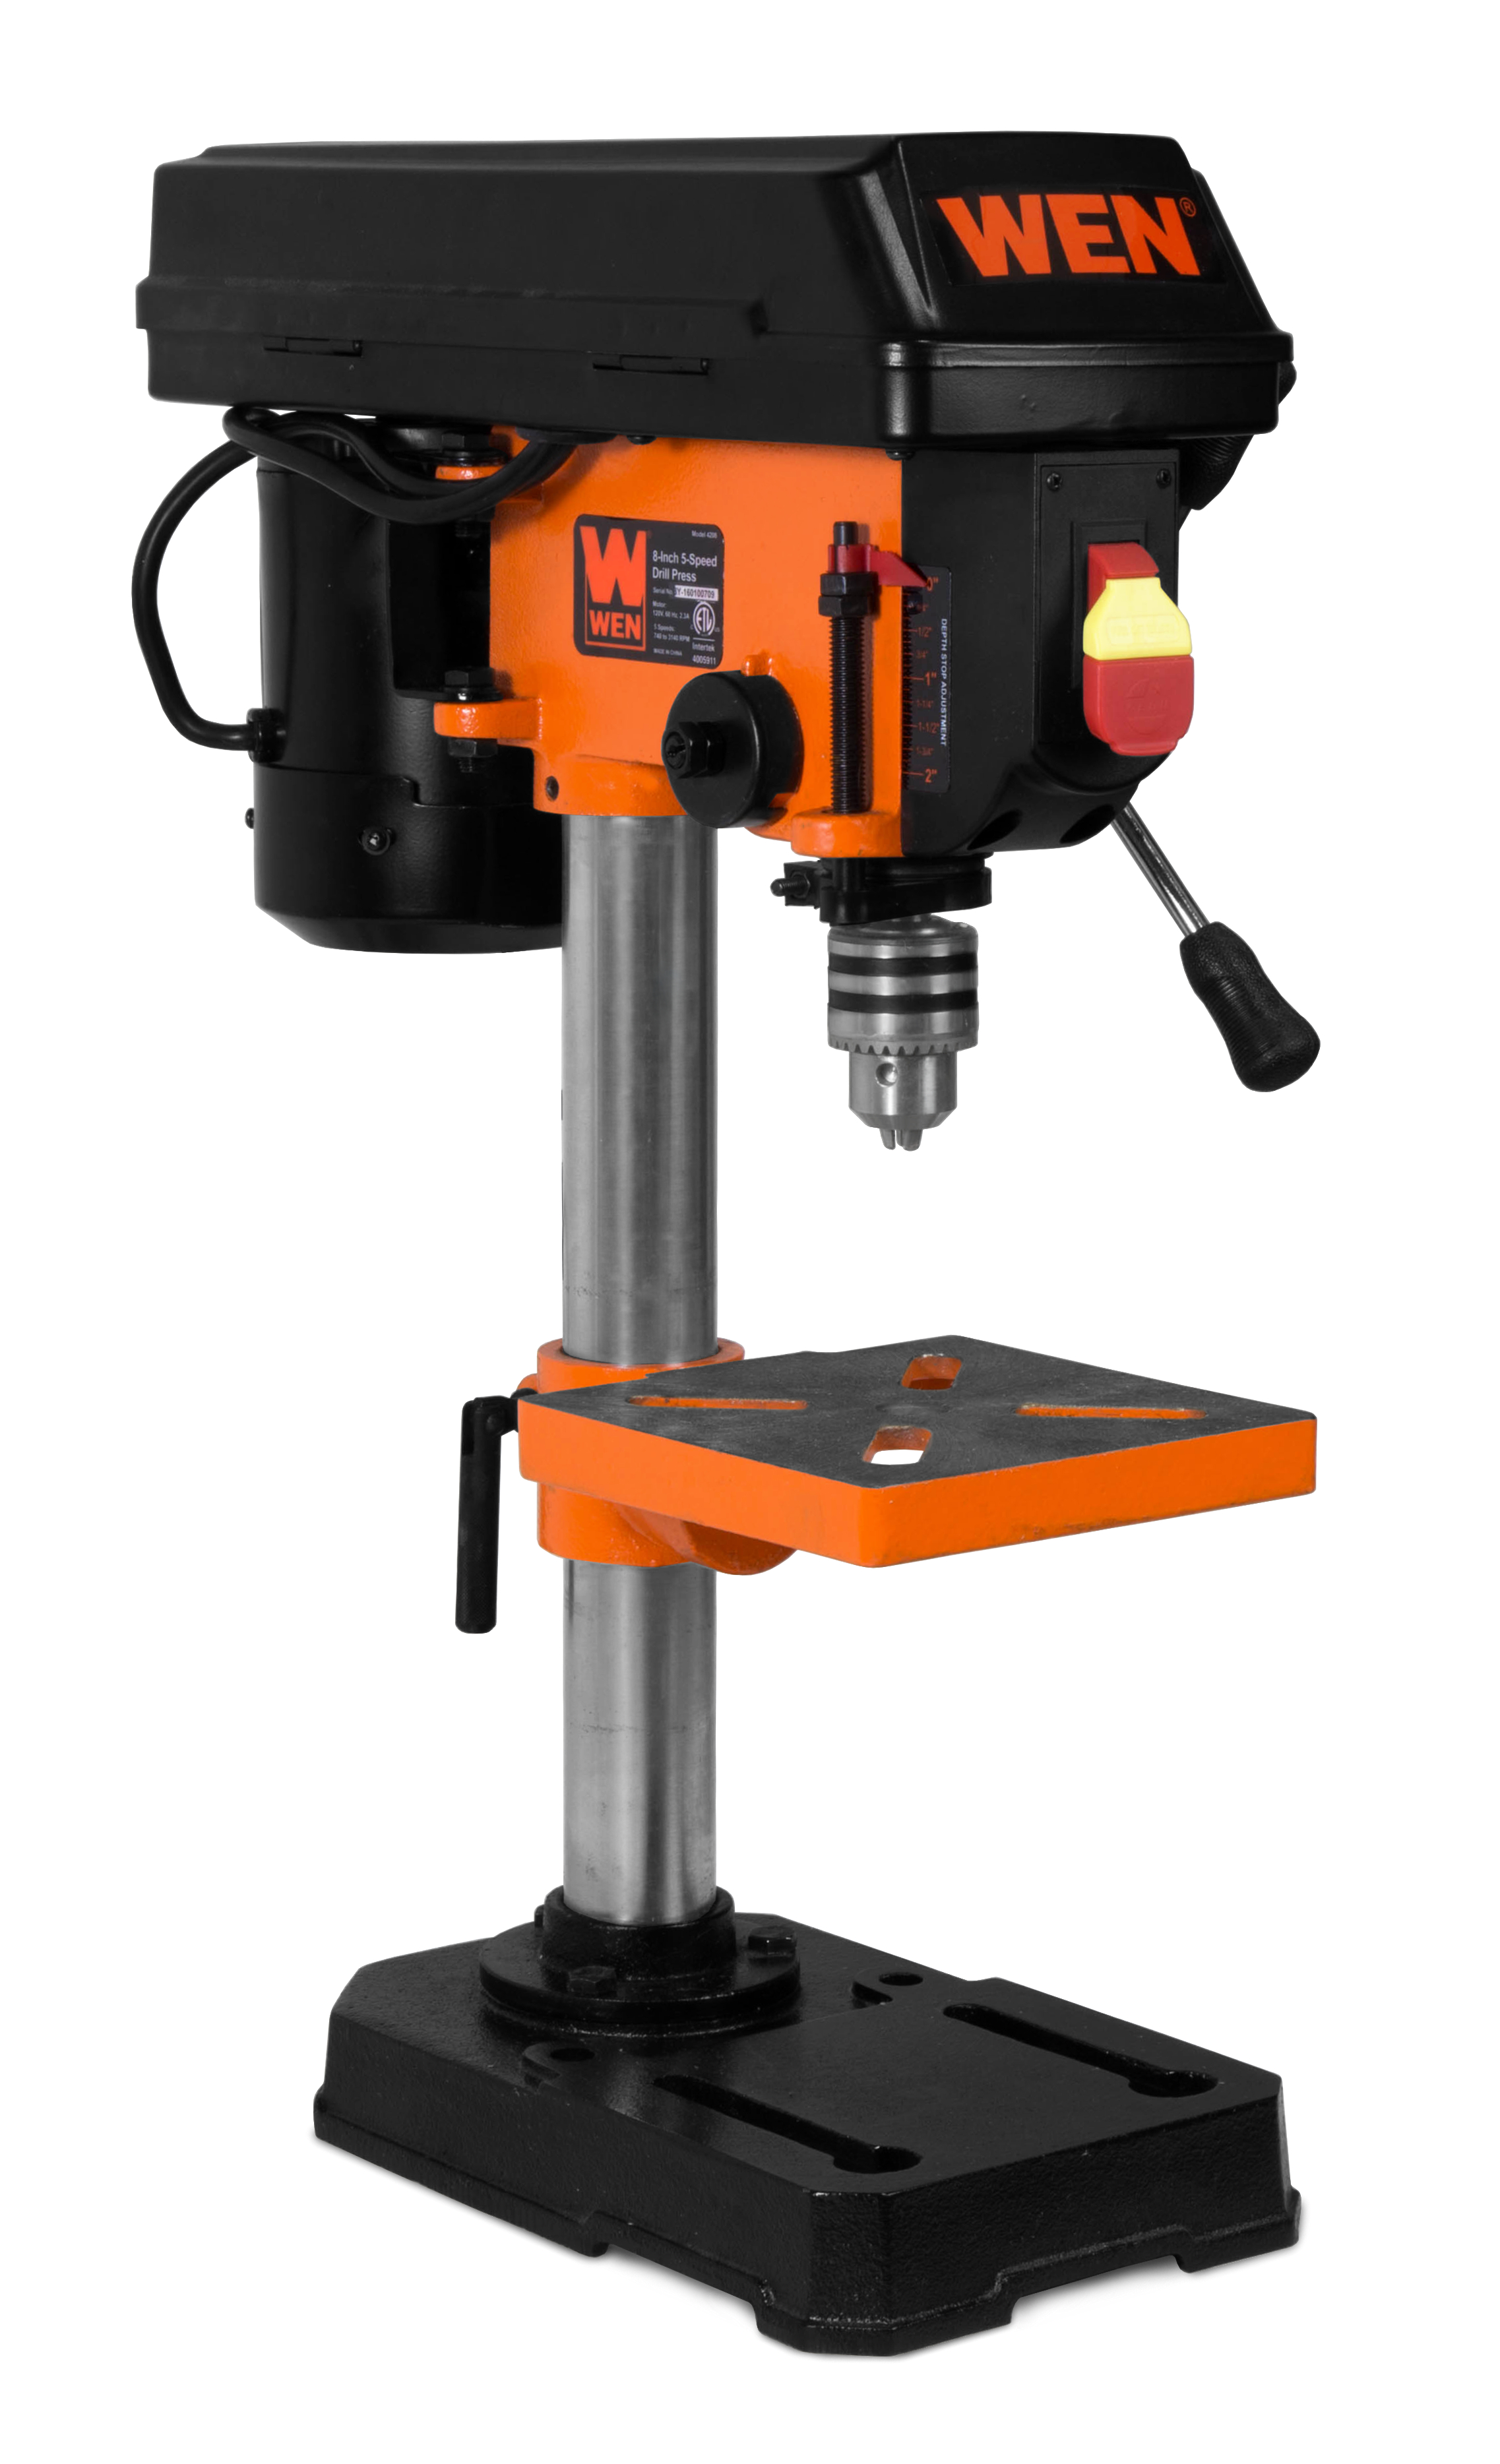 Wen 8 Inch 5 Speed Drill Press 4208 Walmartcom